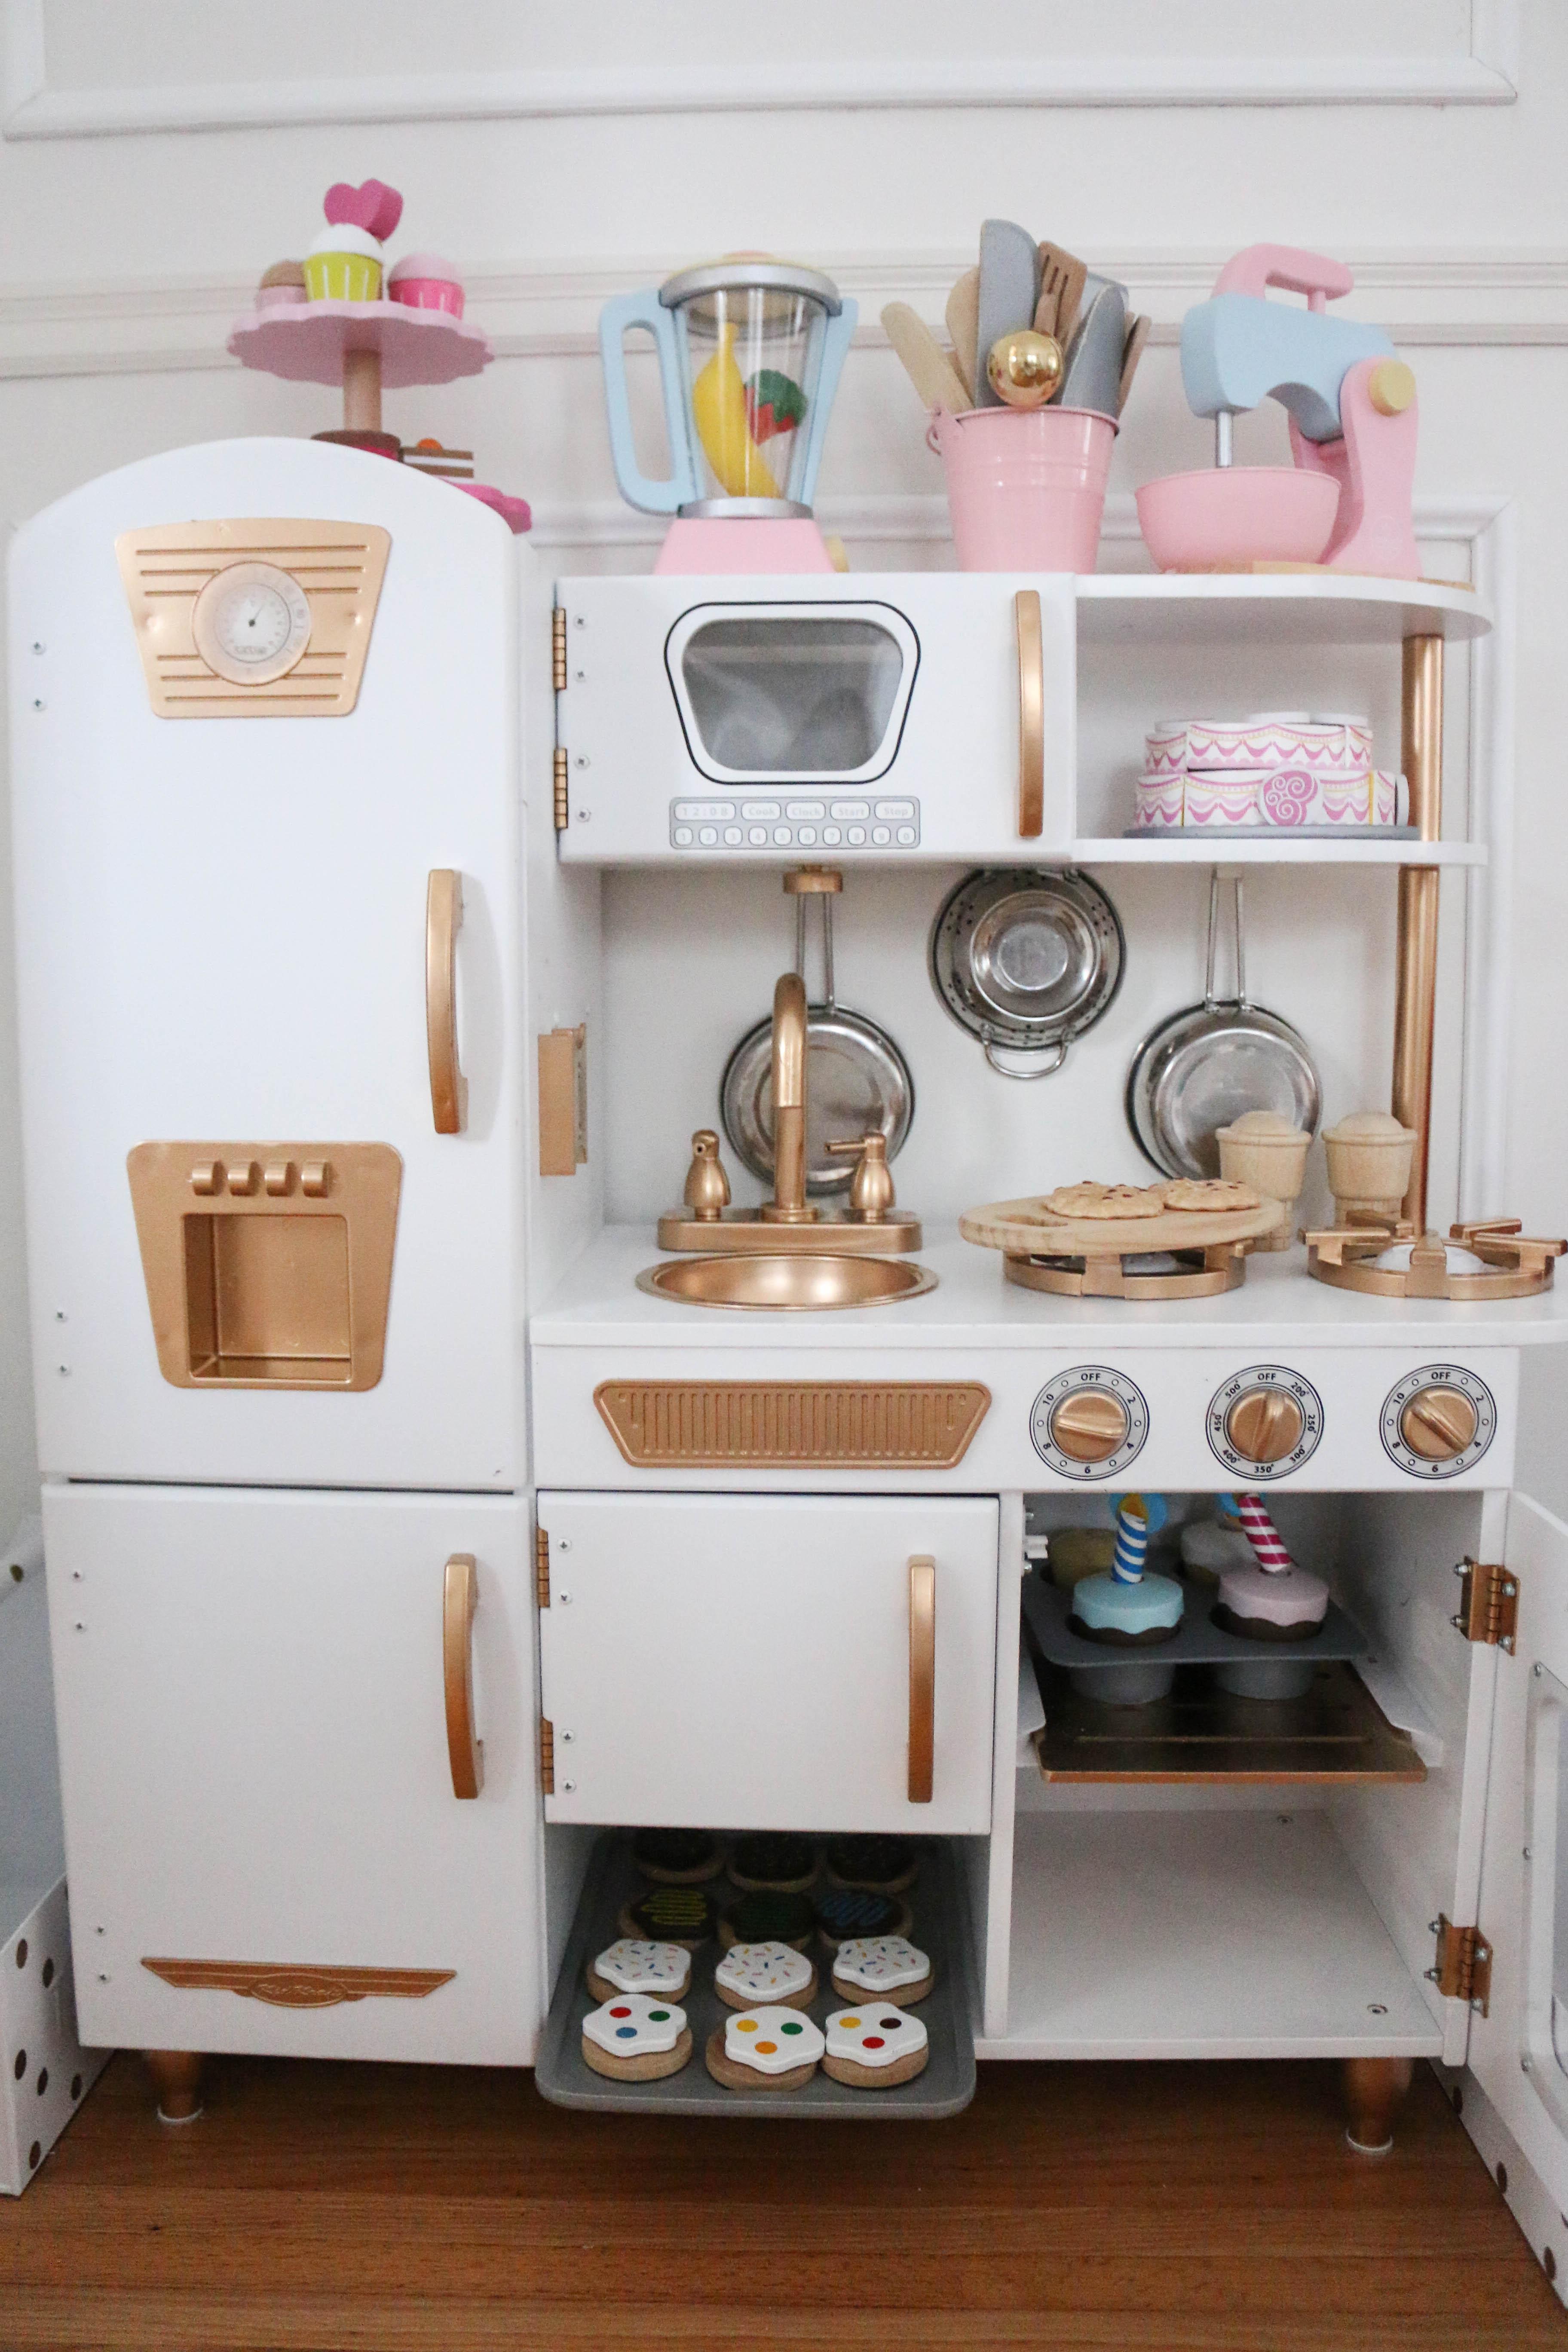 Enchanting Kidkraft Vintage Kitchen In Pink Adornment - Kitchen ...